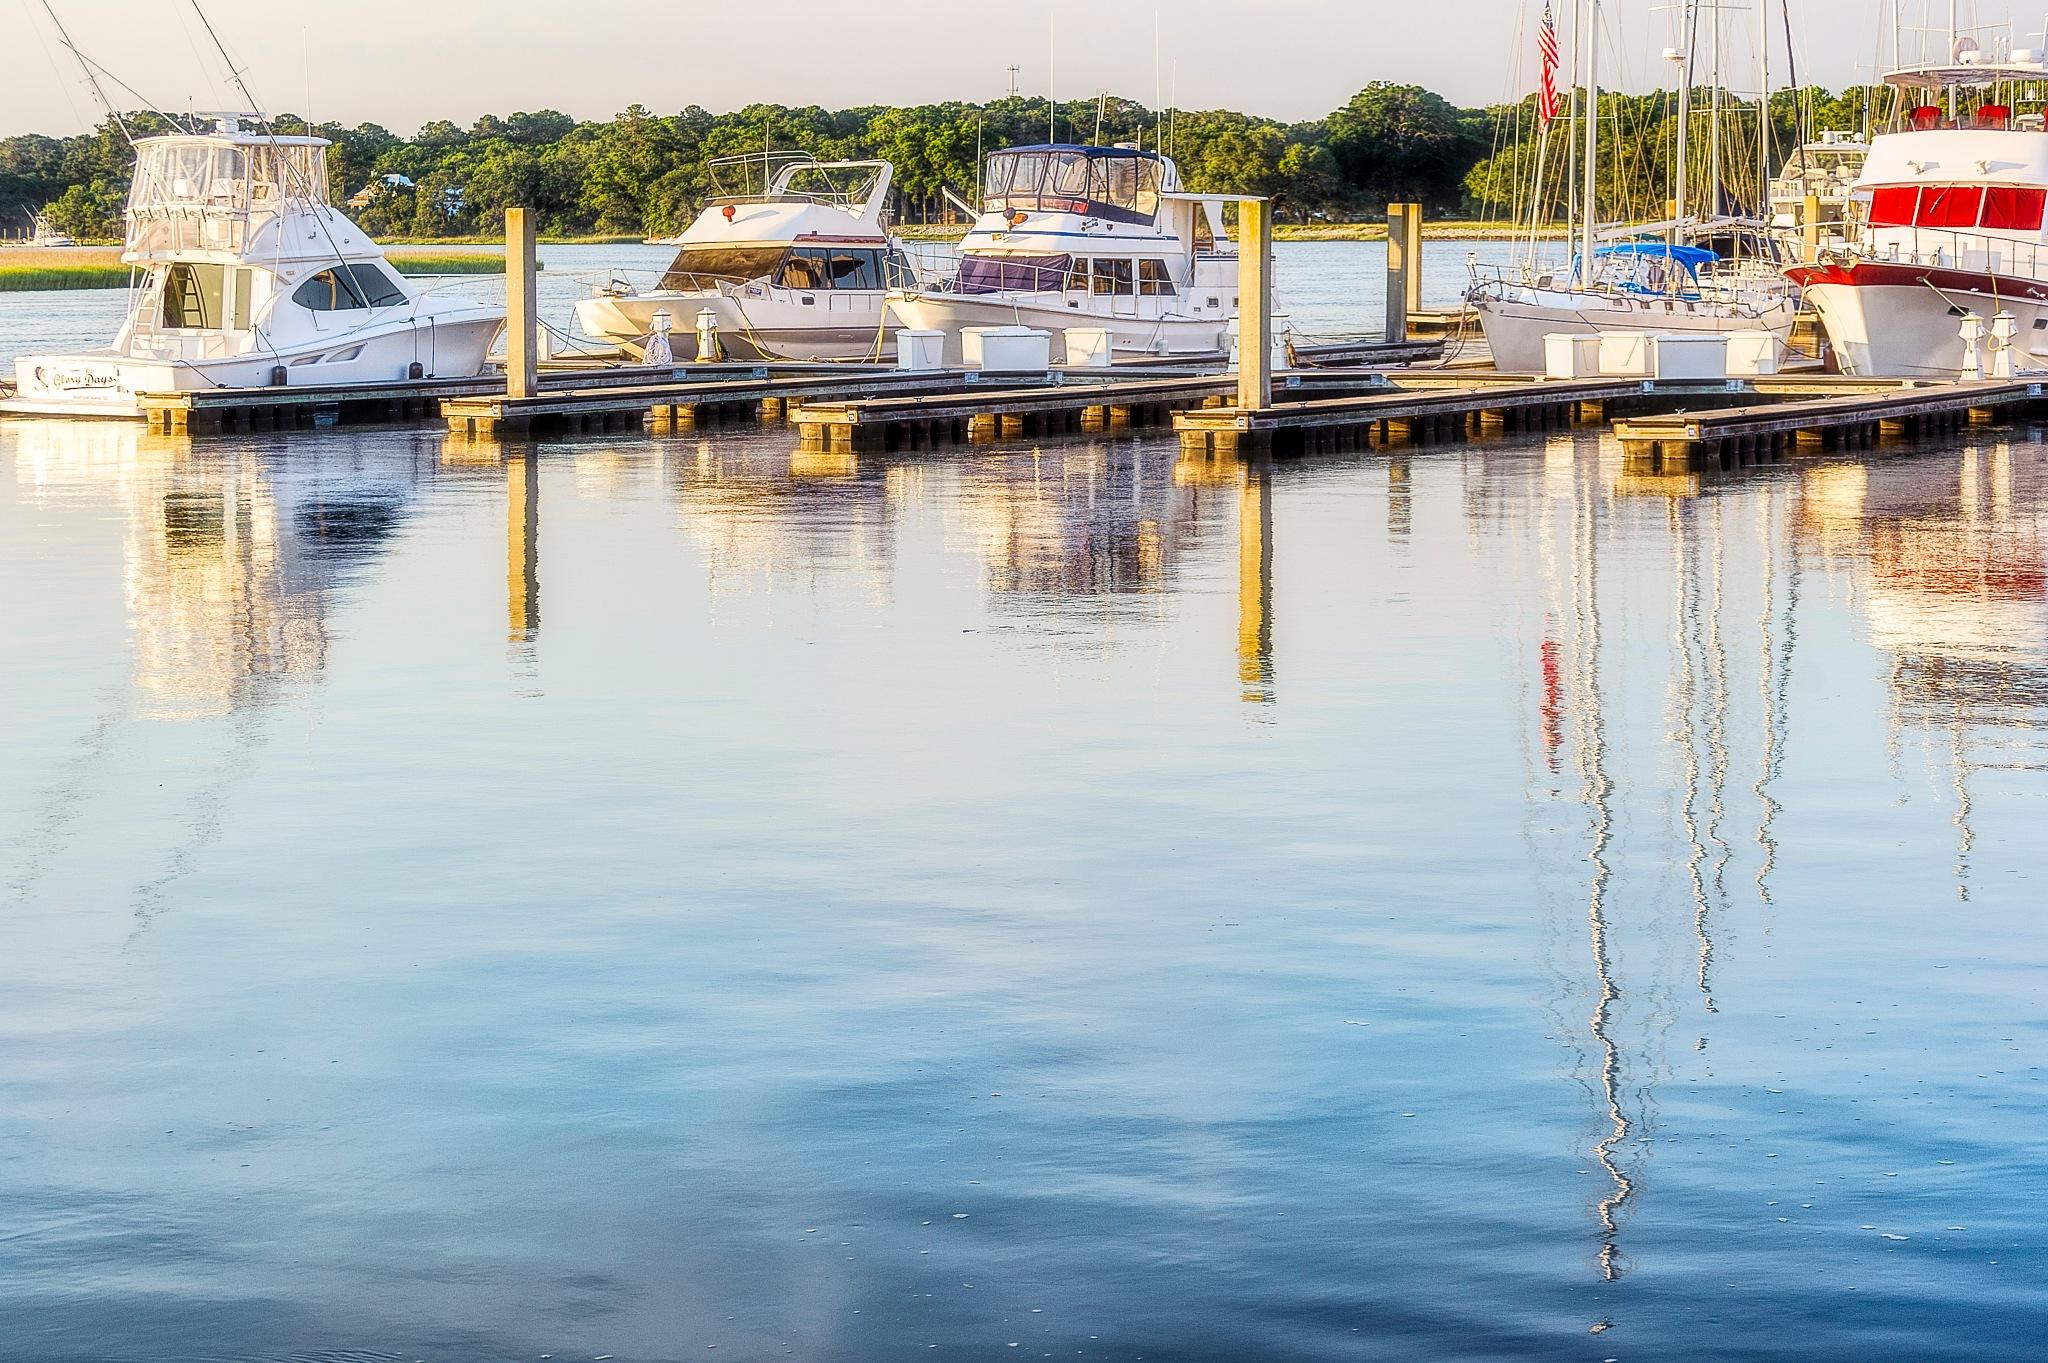 marina scene by Gerry Daniel